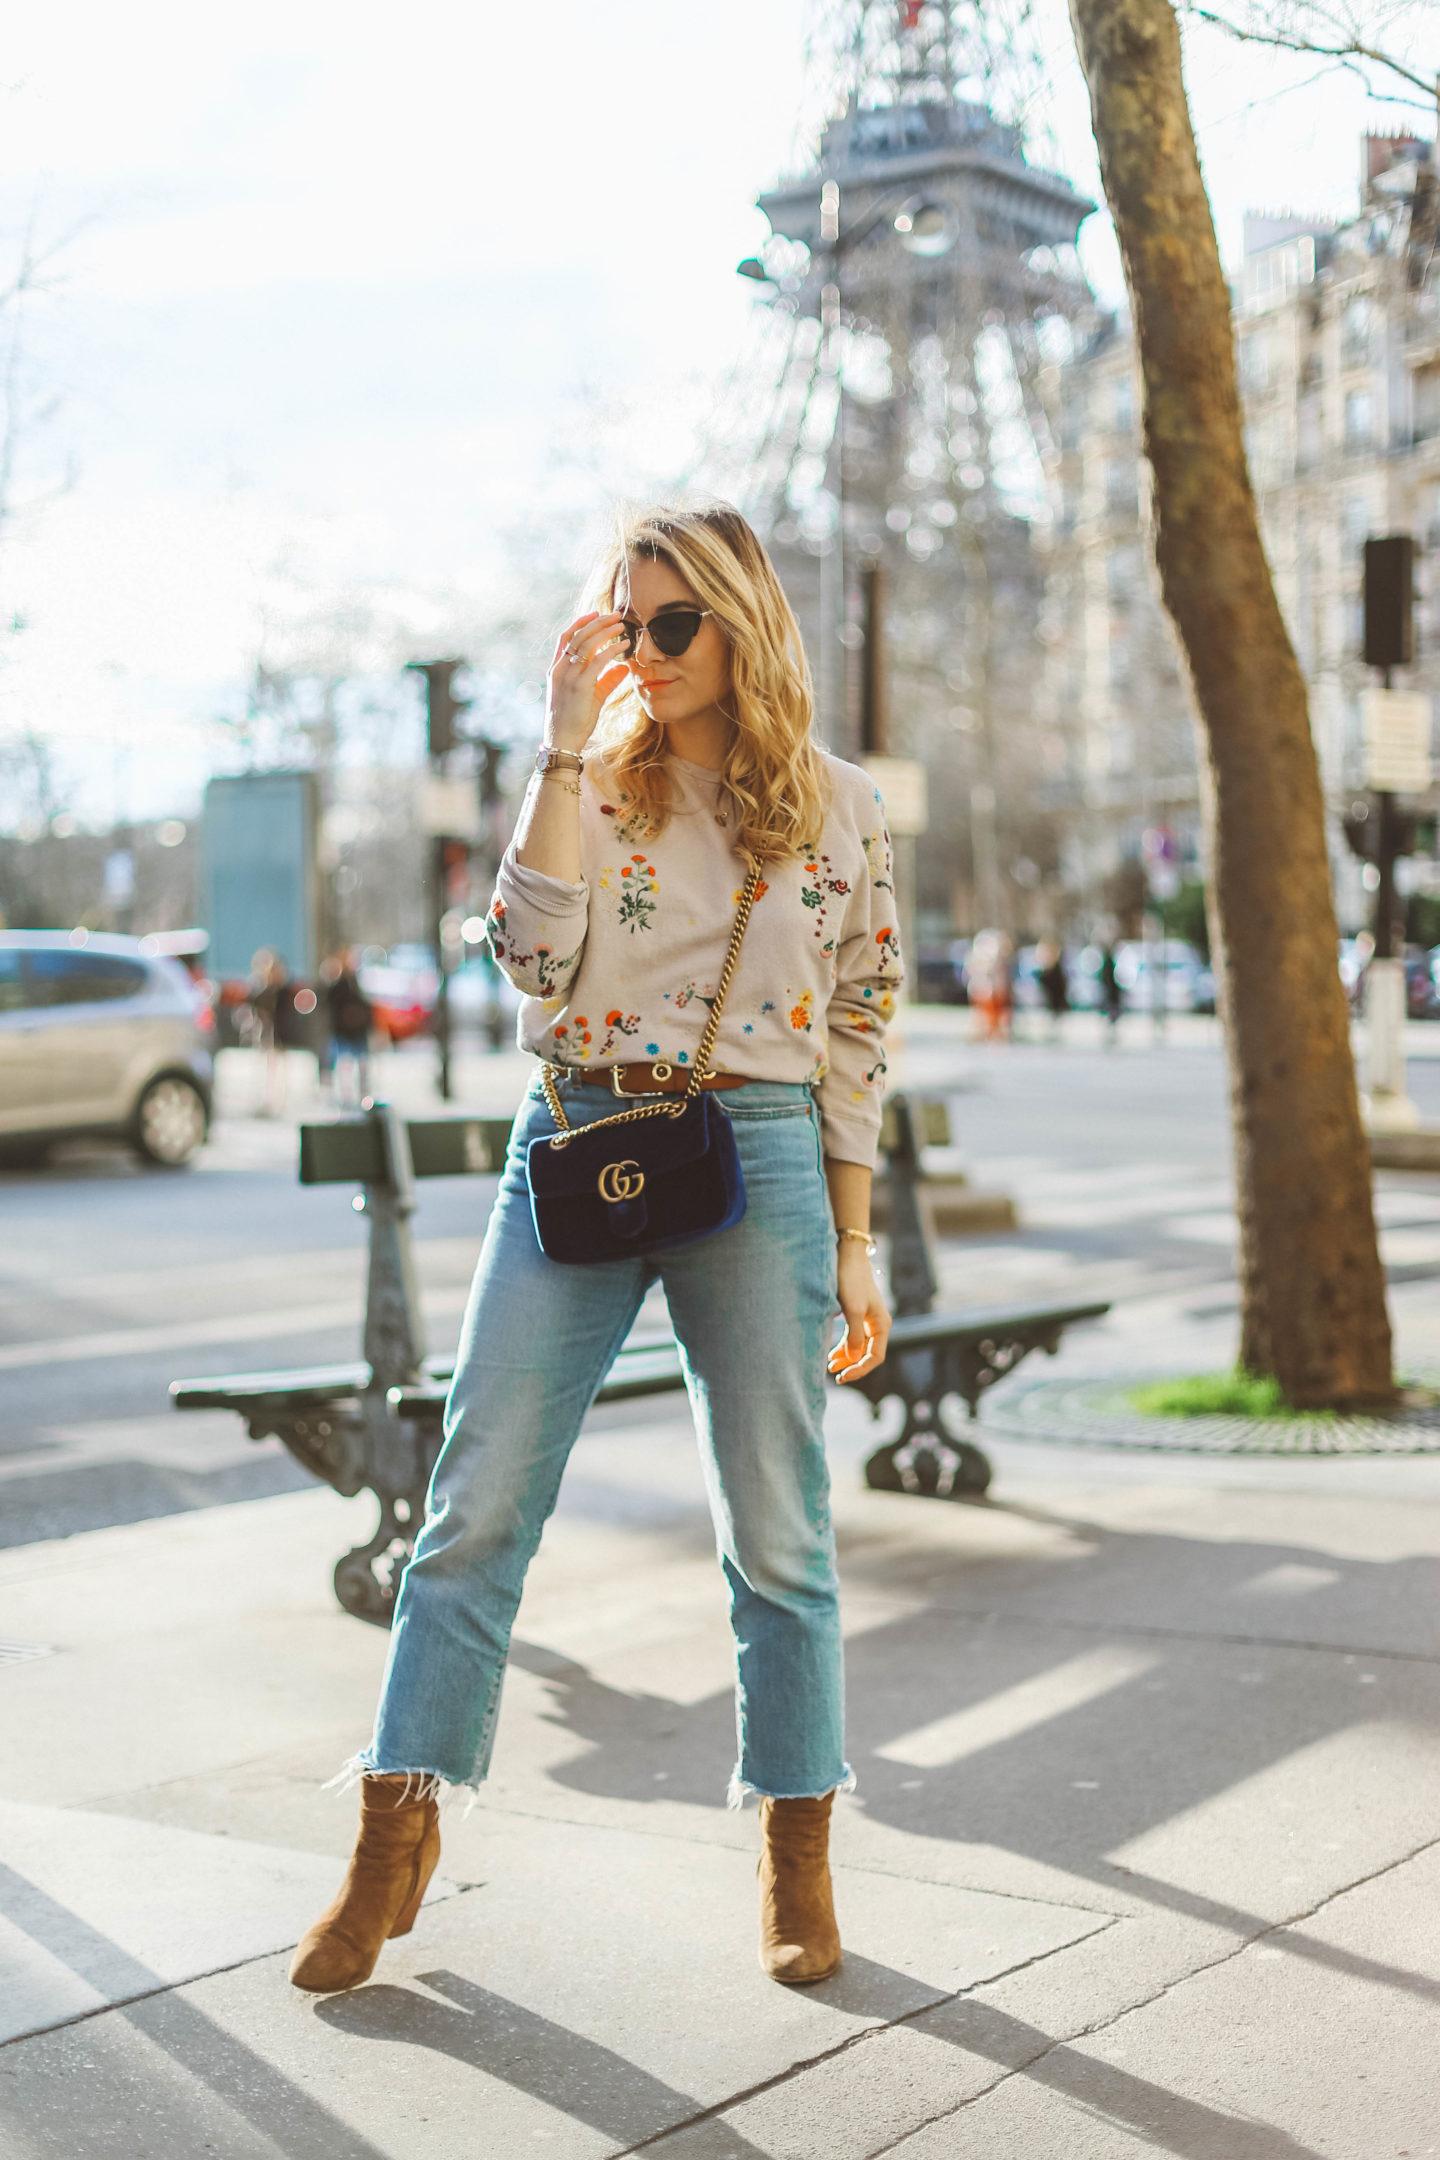 Wavy Hair - Blondie Baby blog mode et voyages